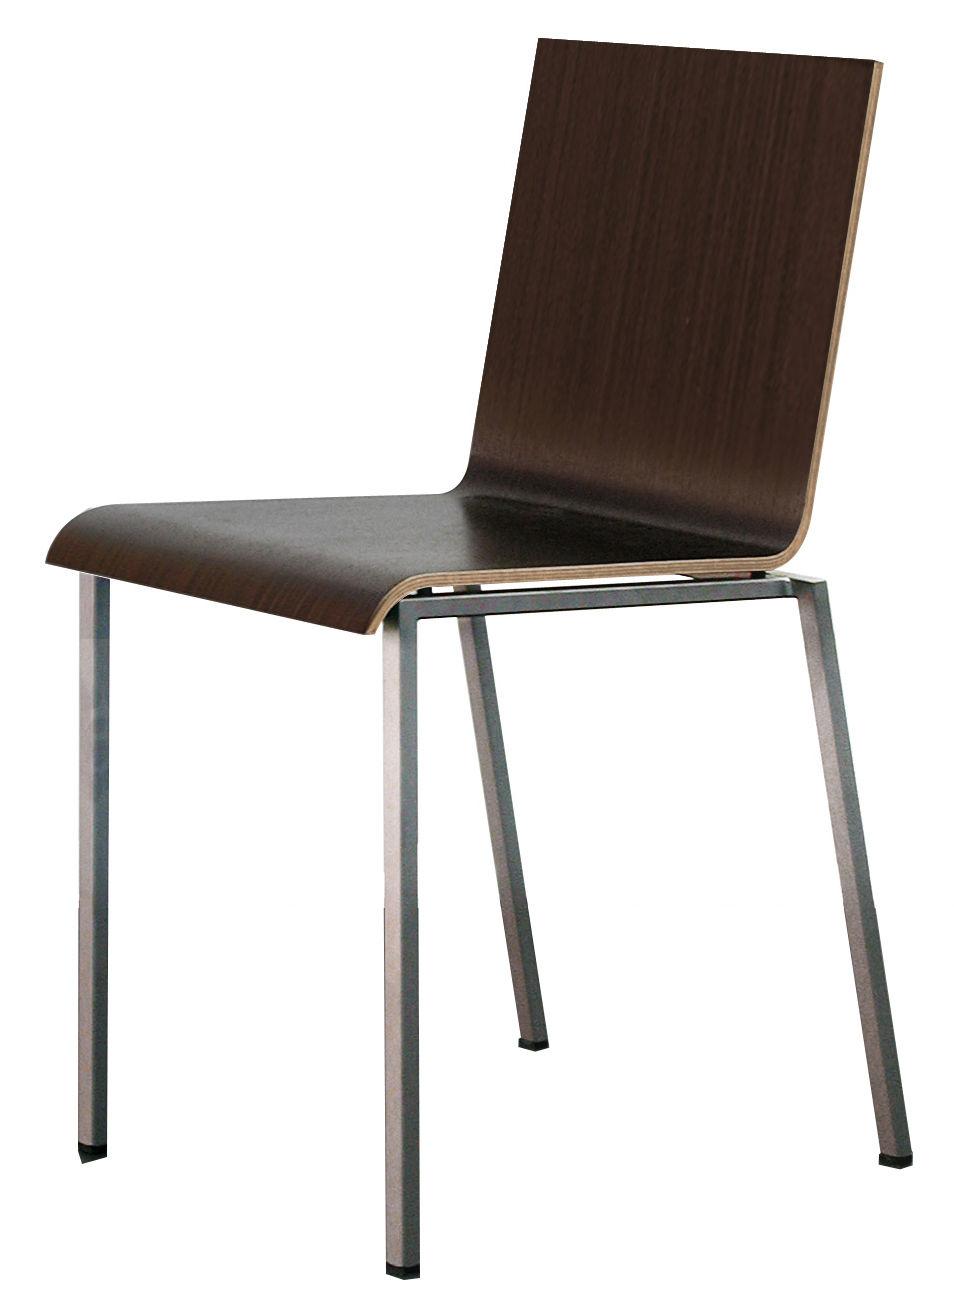 Bianca sedia versione legno weng by zeus made in design - Sedia bianca legno ...